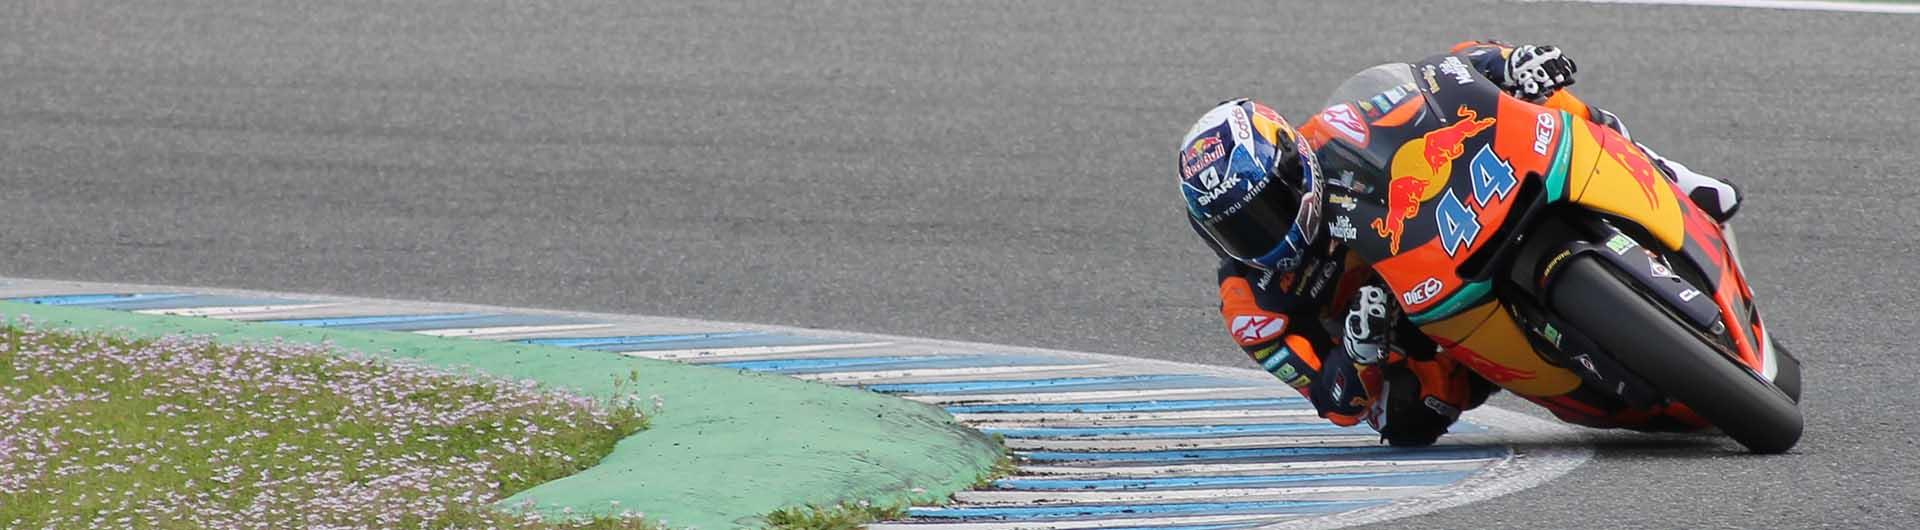 Miguel Oliveira testou em Jerez de la Frontera